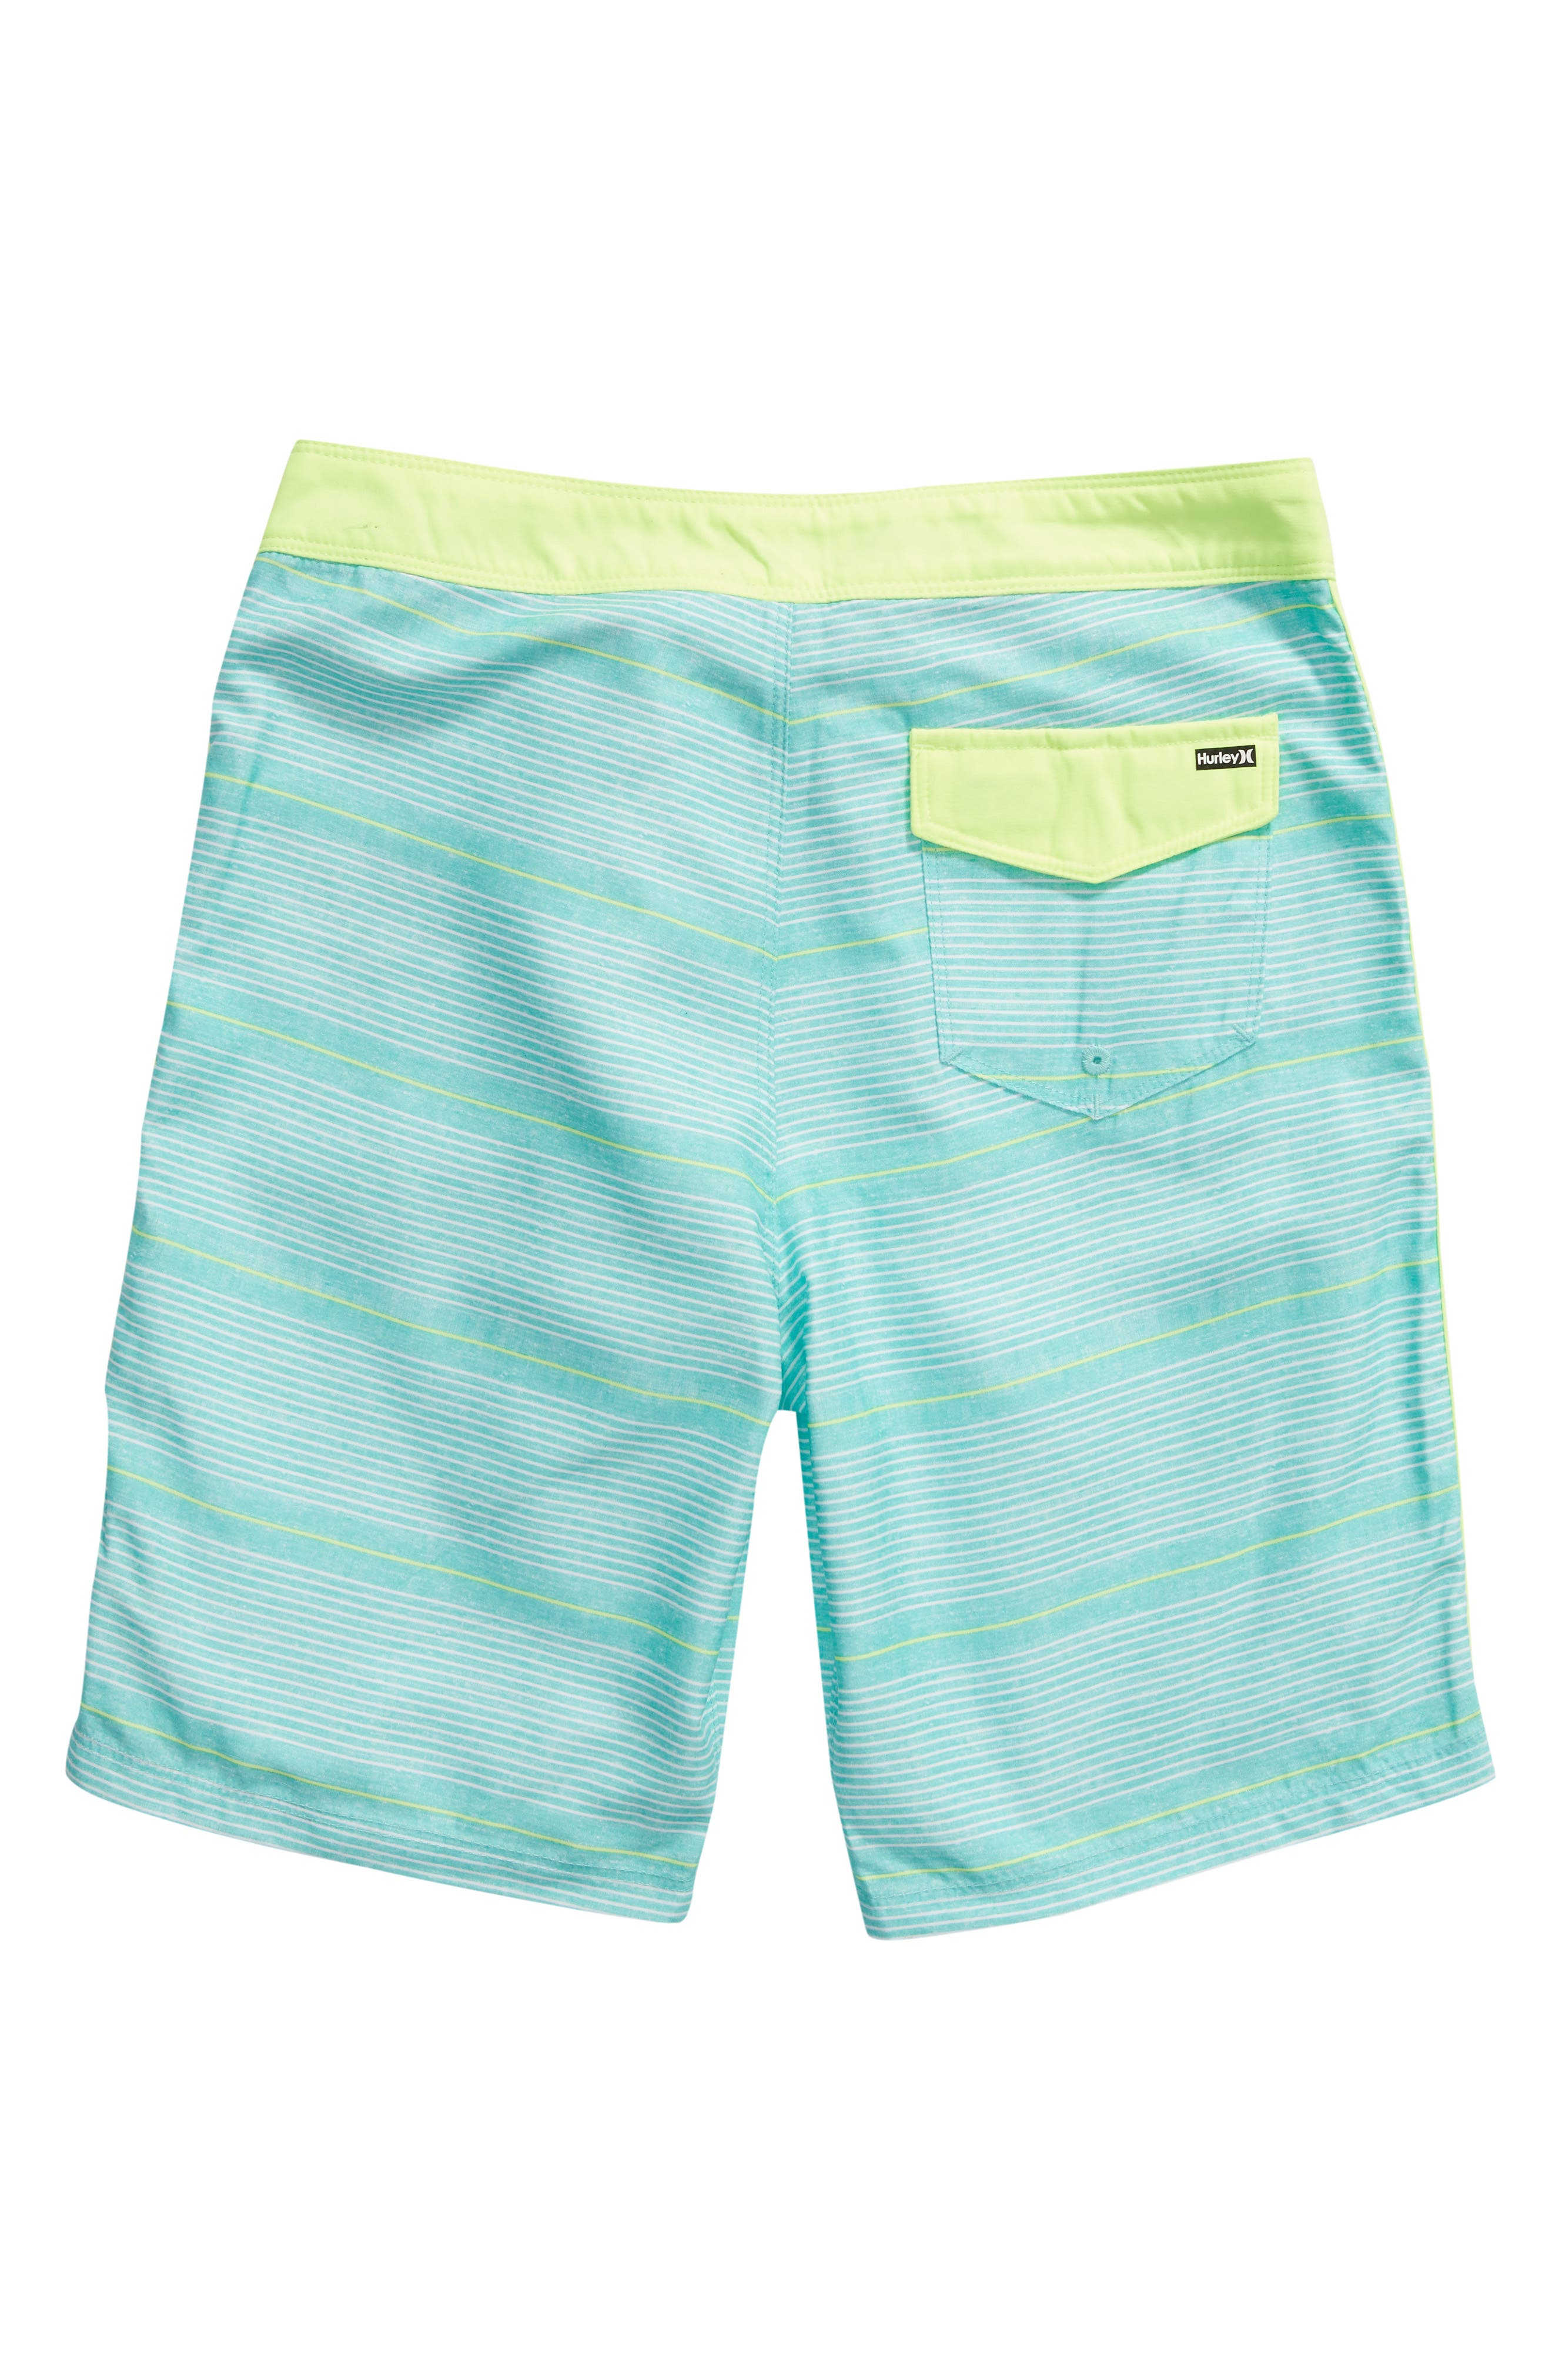 HURLEY, Shoreline Board Shorts, Alternate thumbnail 2, color, TROPICAL TWIST